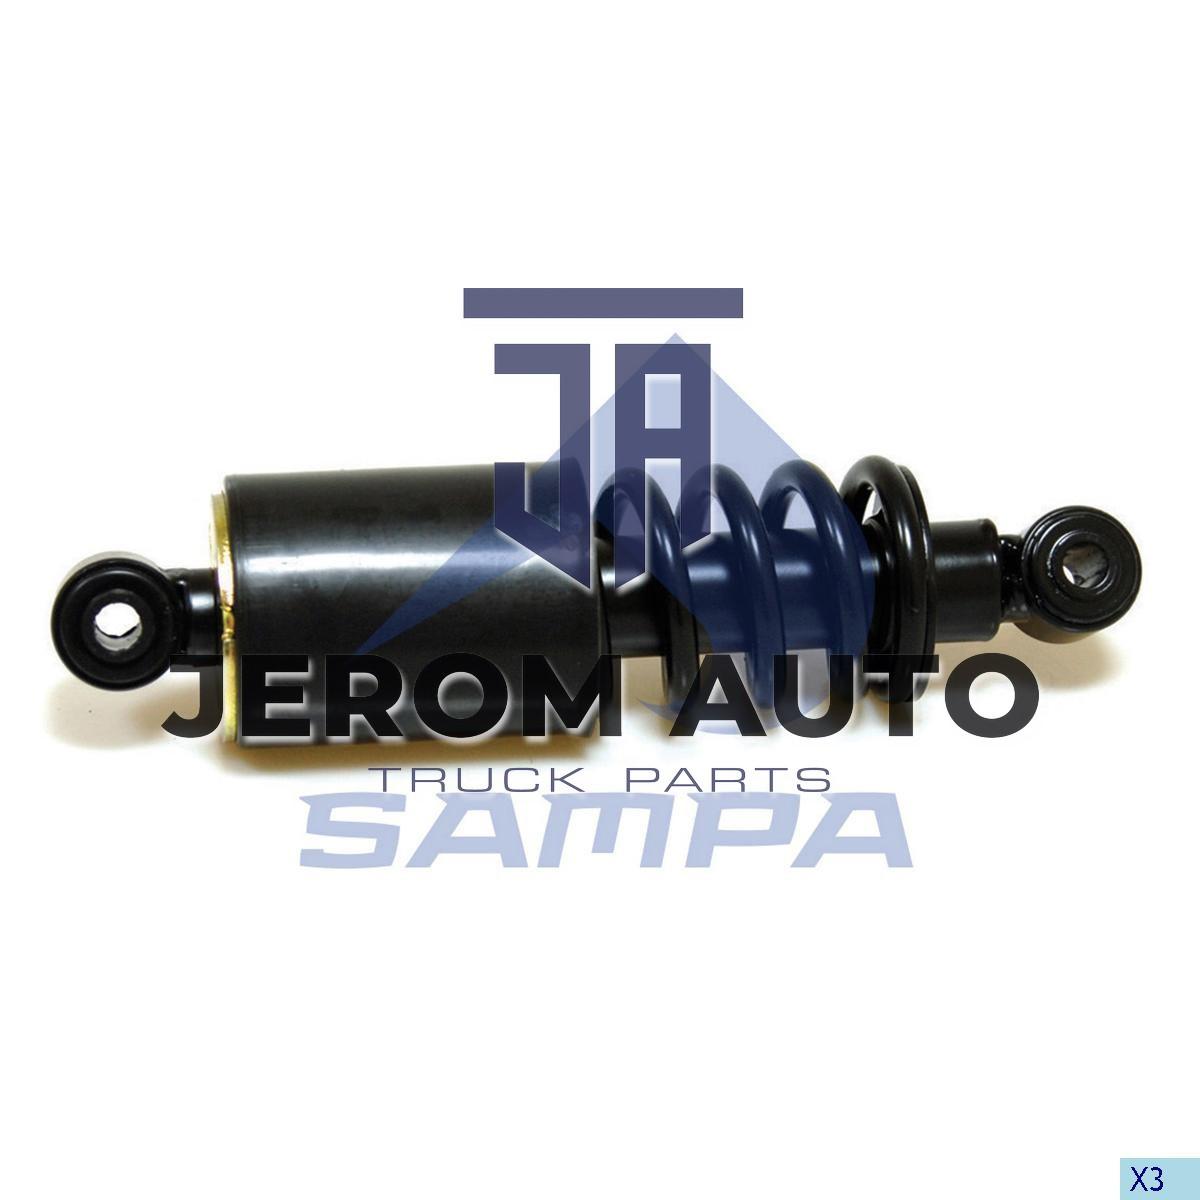 Амортизатор кабины MAN (d14xd45/d84x202/295) \81417226046 \ 020.293